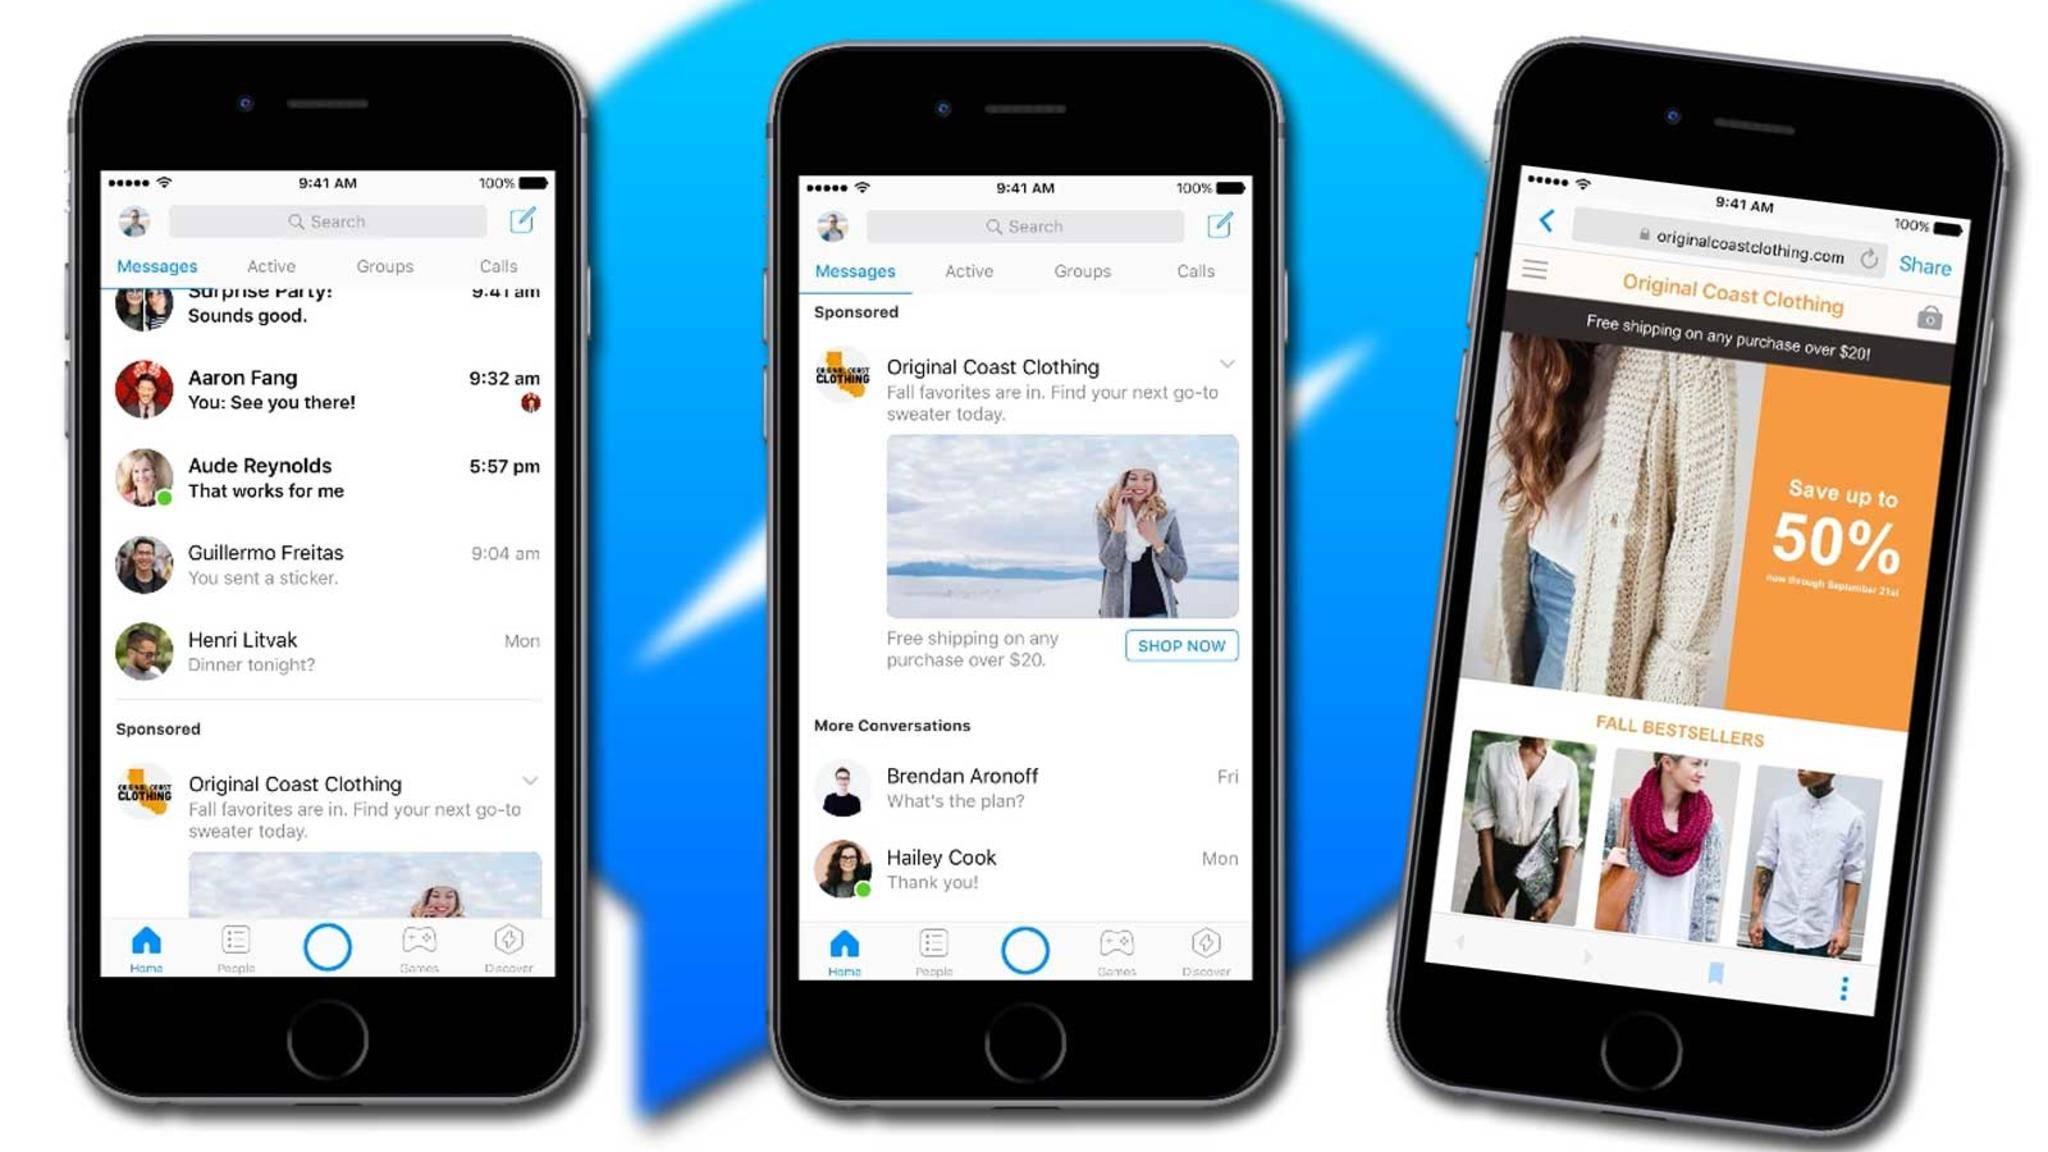 Bald sieht man Werbung auch im Facebook Messenger.